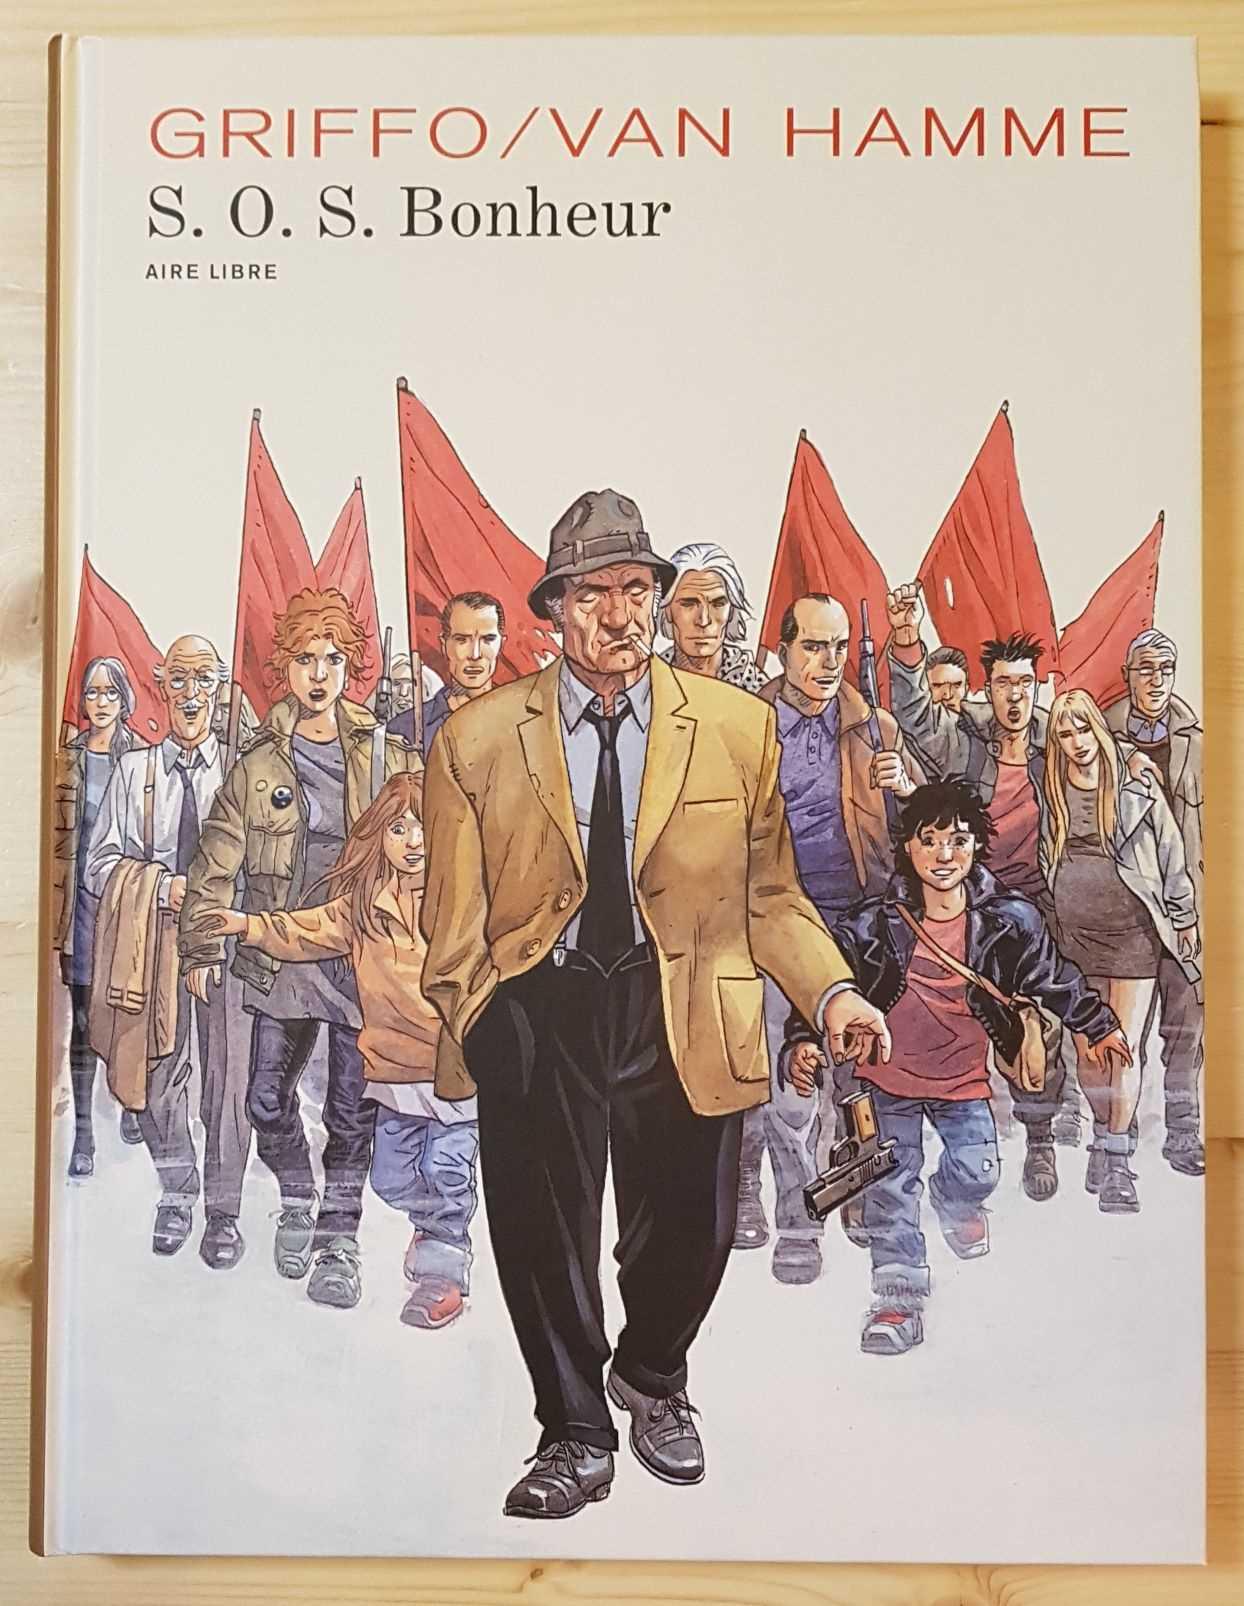 S.O.S Bonheur Saison 1